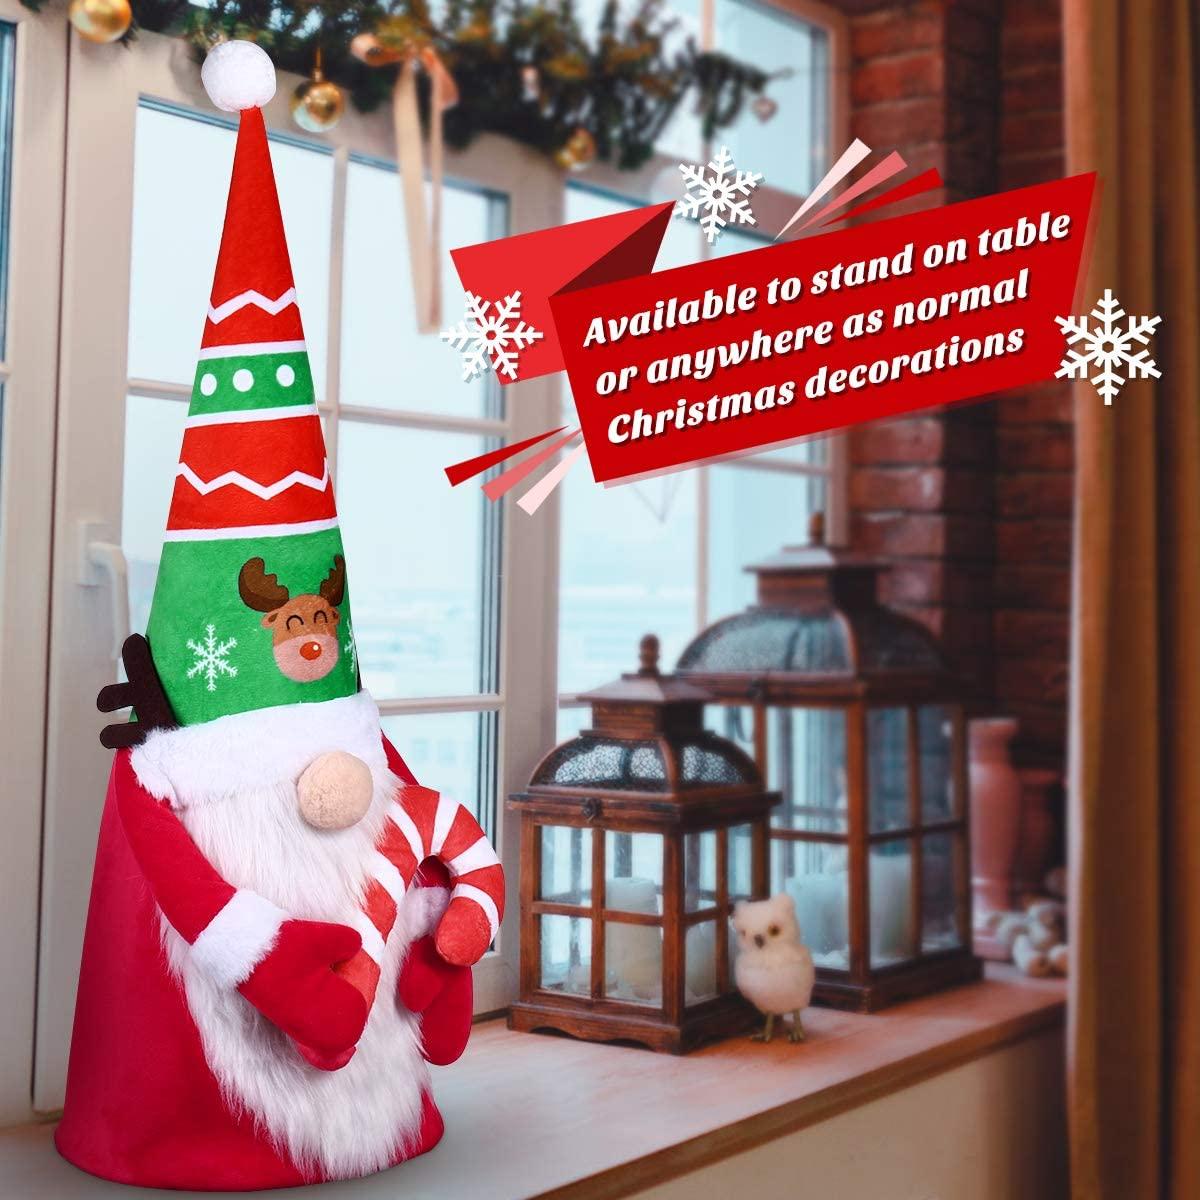 Christmas Gnome Tree Topper, Gnome Christmas Tree Topper Santa Tree Ornament for Holiday Home Decor